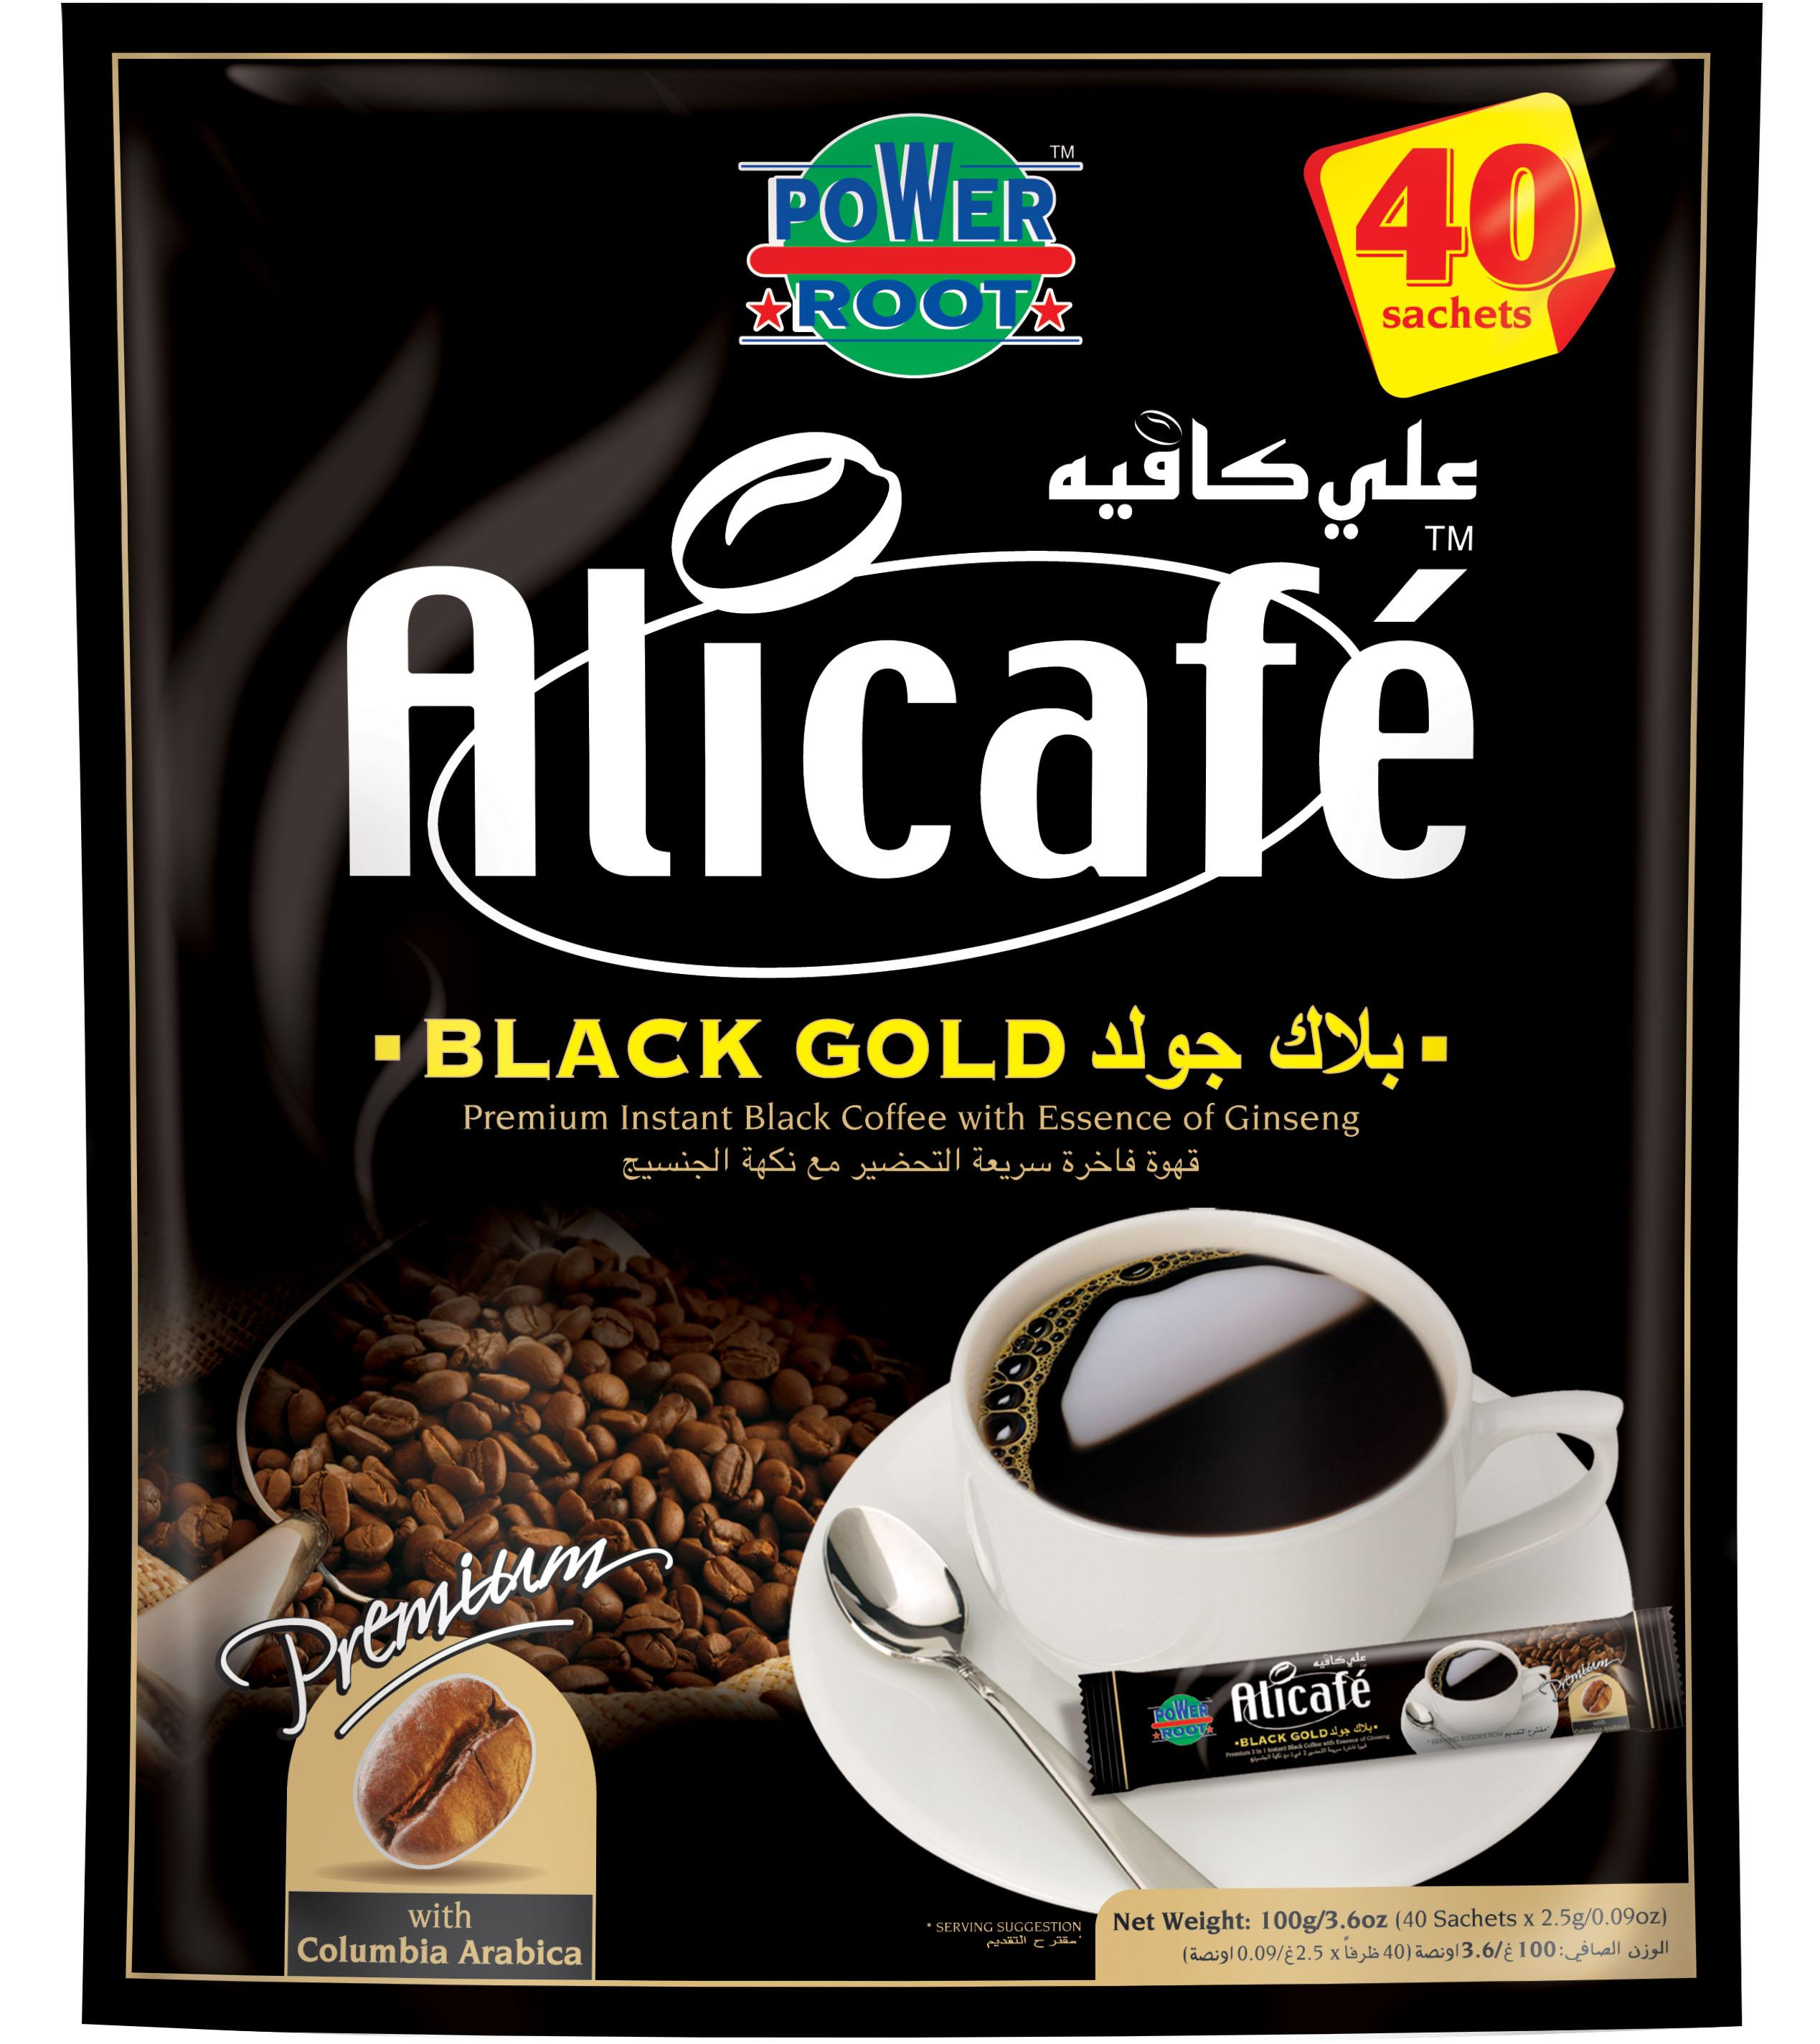 Alicafe Value Added